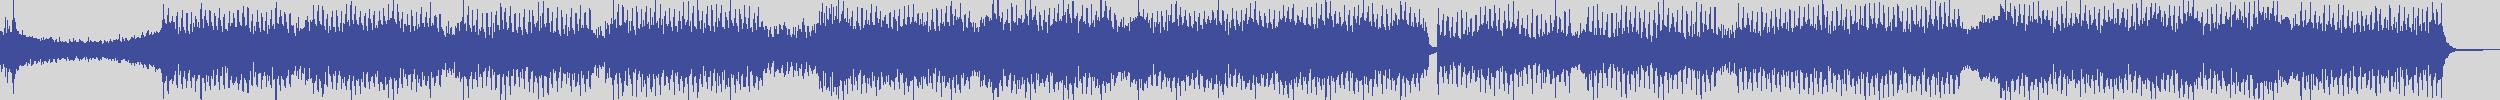 just_digital_records [JS1406] Sugar Freak - Music Change My Life [Angeless Club Radio Cut] audio wave form